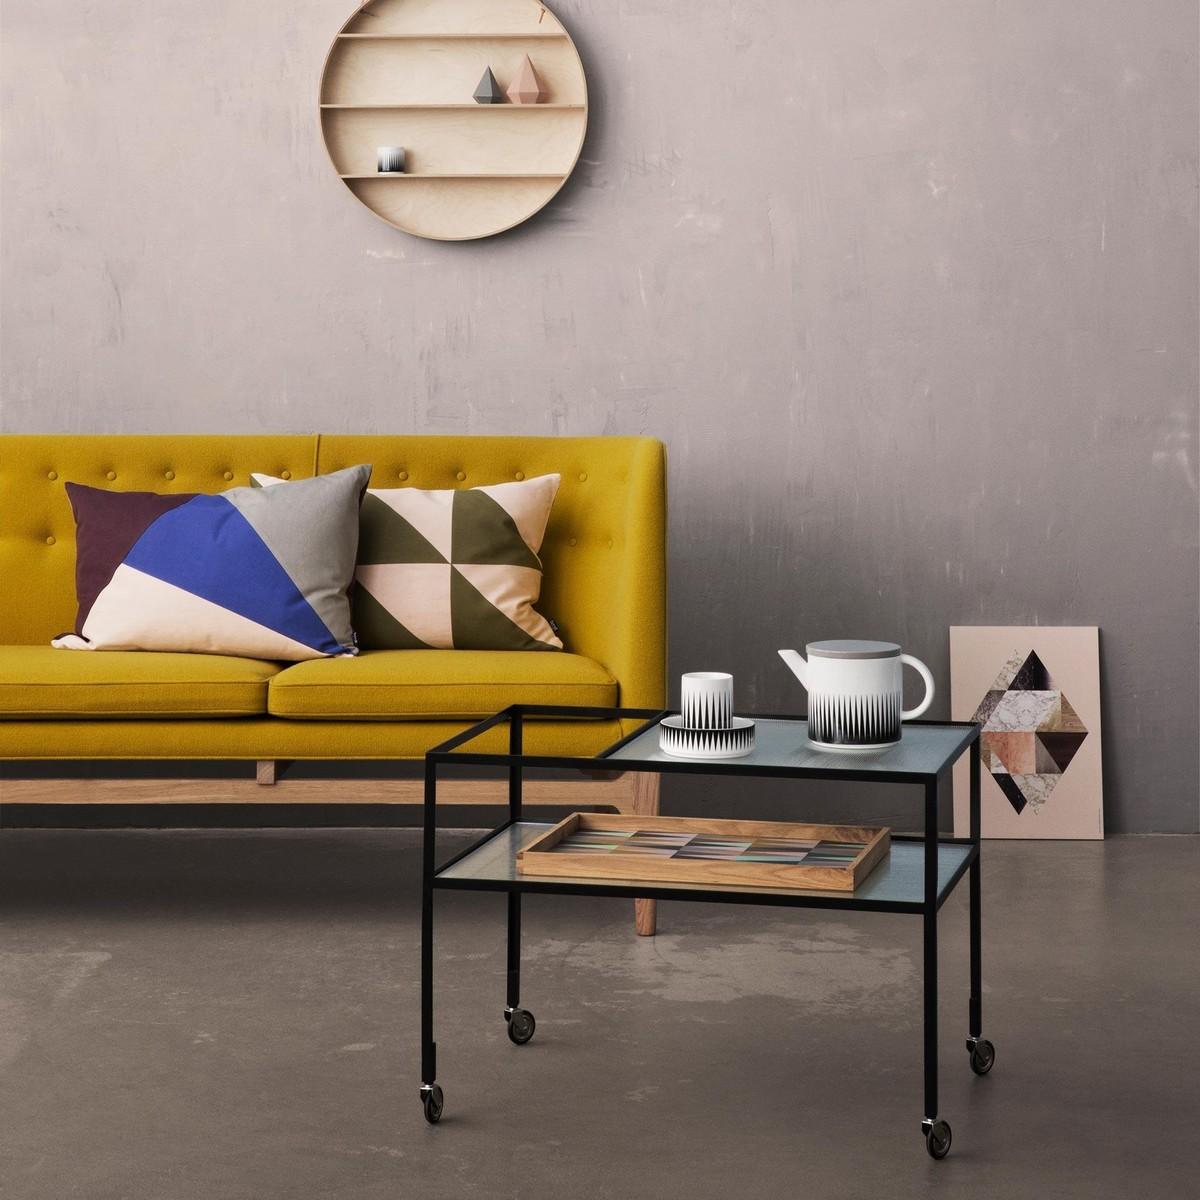 herbert hirche barwagen servierwagen richard lampert. Black Bedroom Furniture Sets. Home Design Ideas